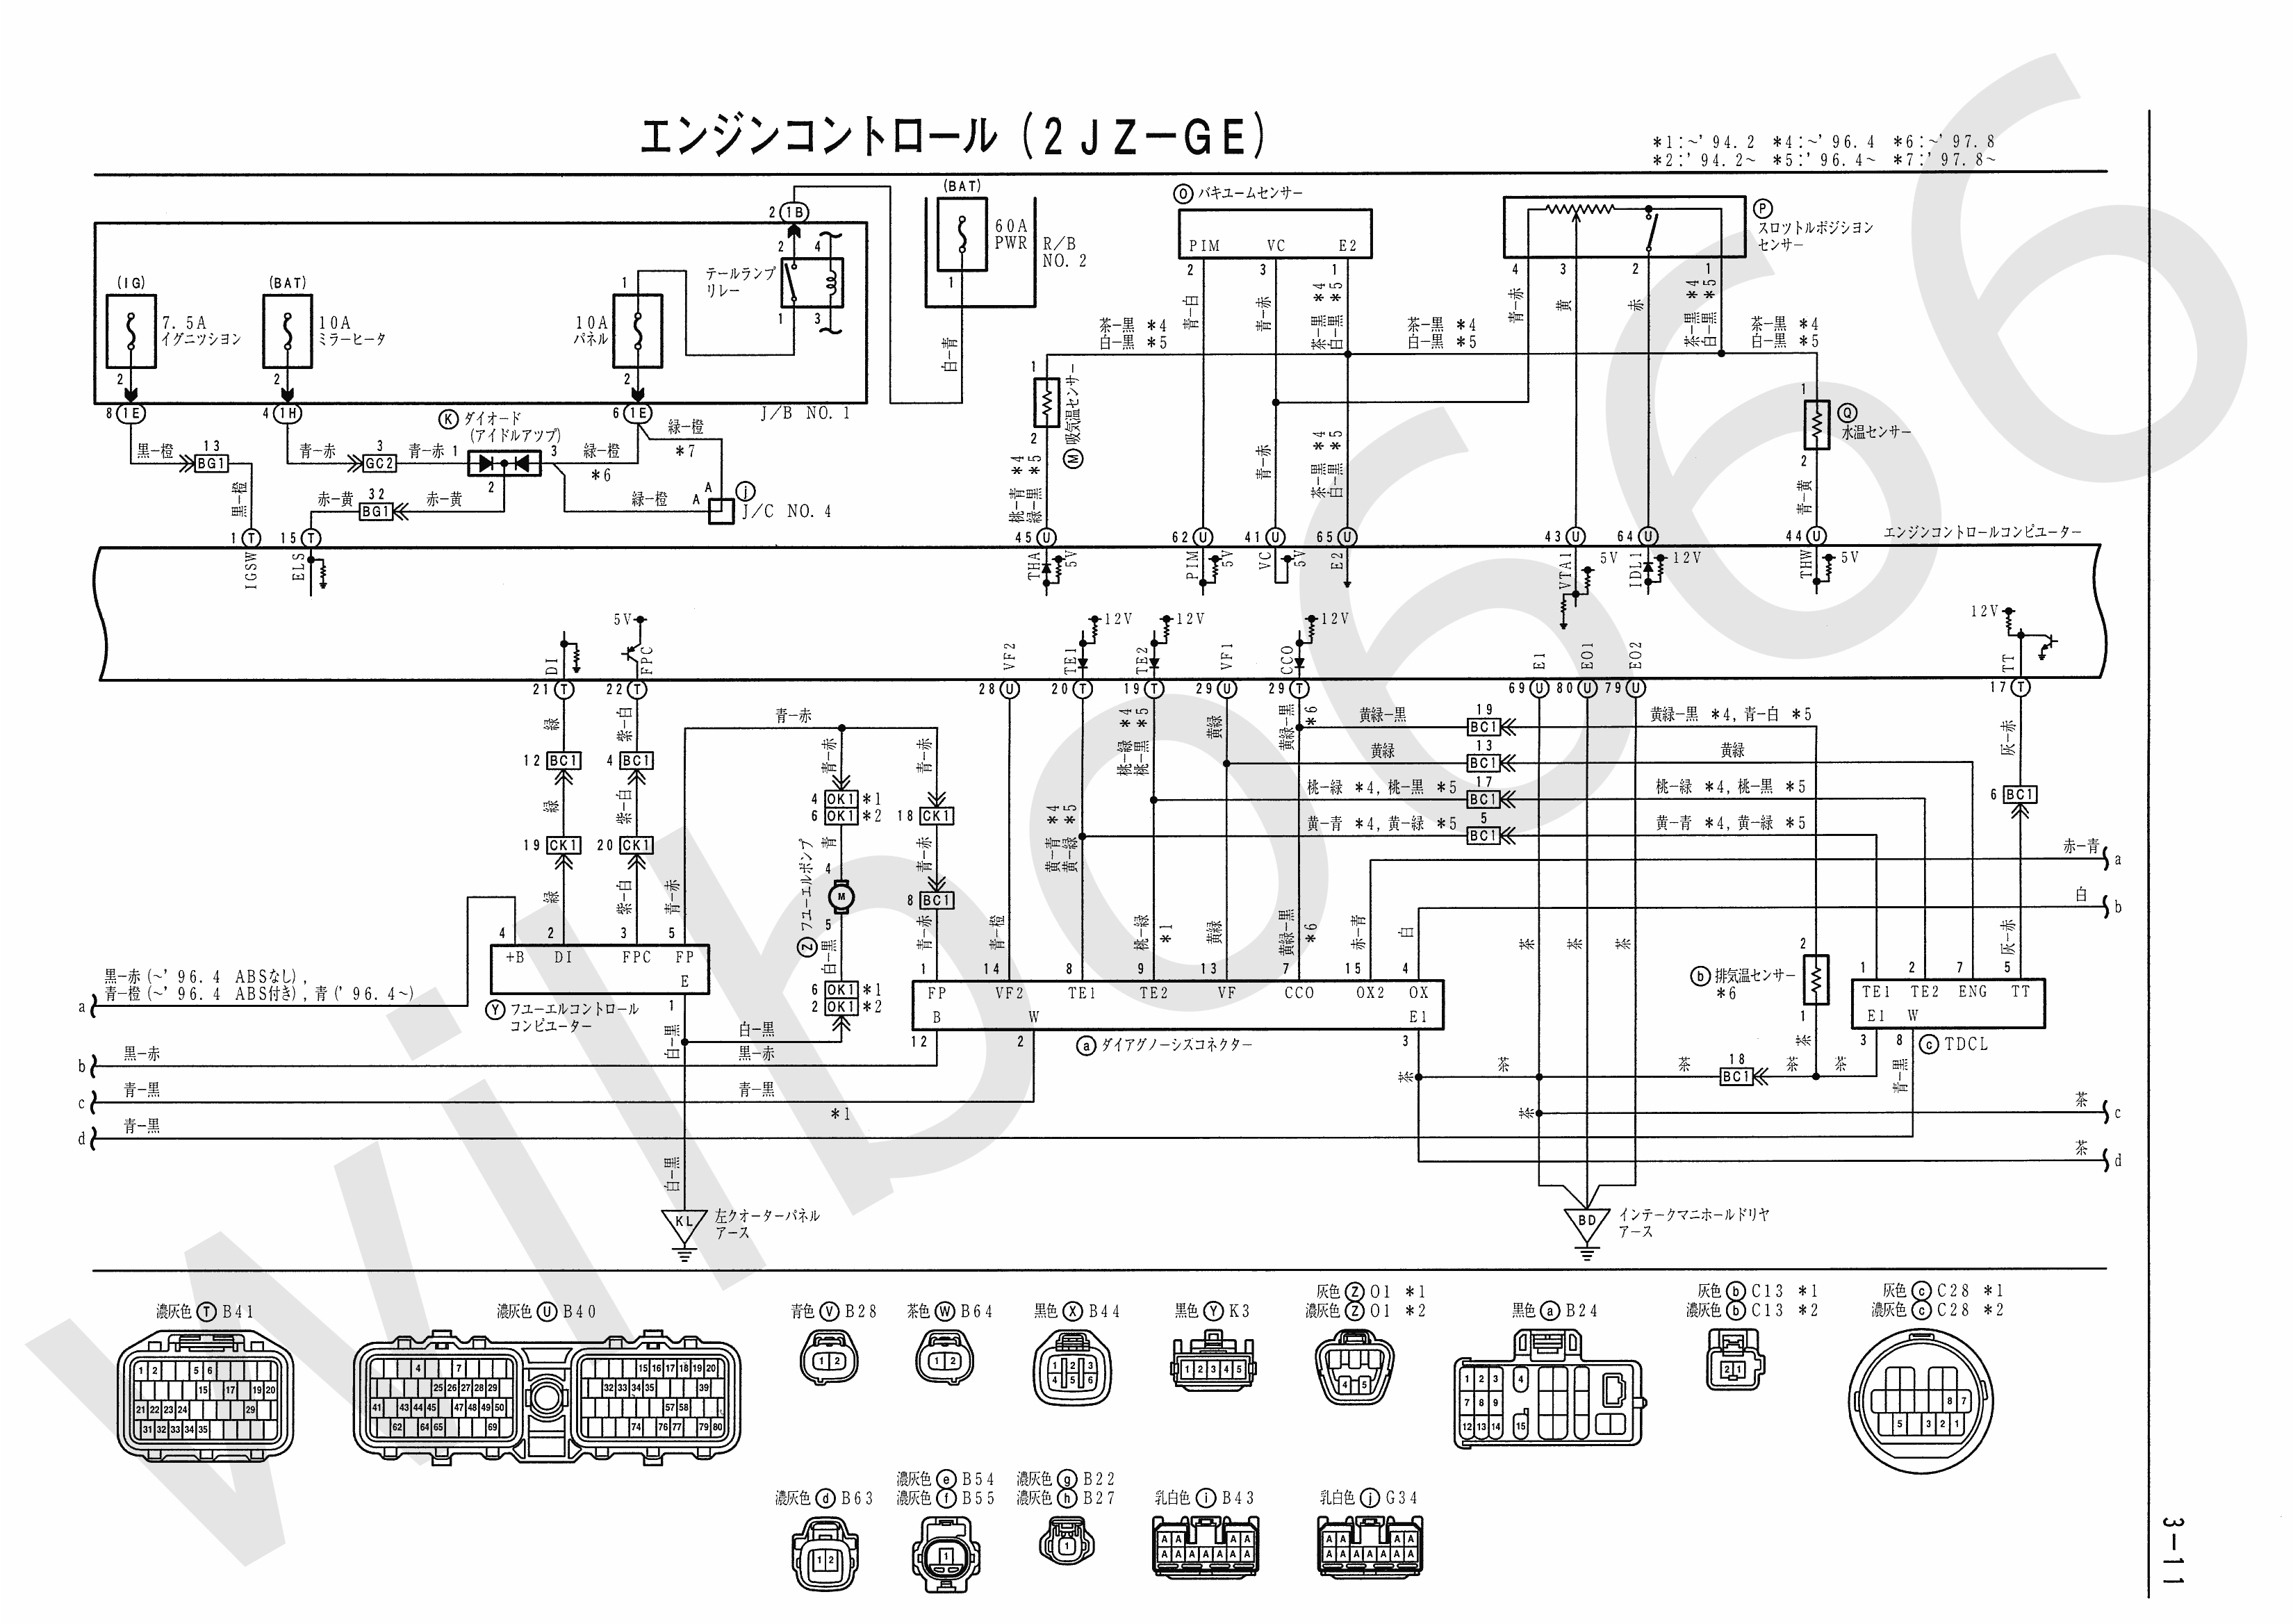 1989 toyota supra fuse diagram tz 5139  engine wiring diagram as well on wiring diagram toyota  tz 5139  engine wiring diagram as well